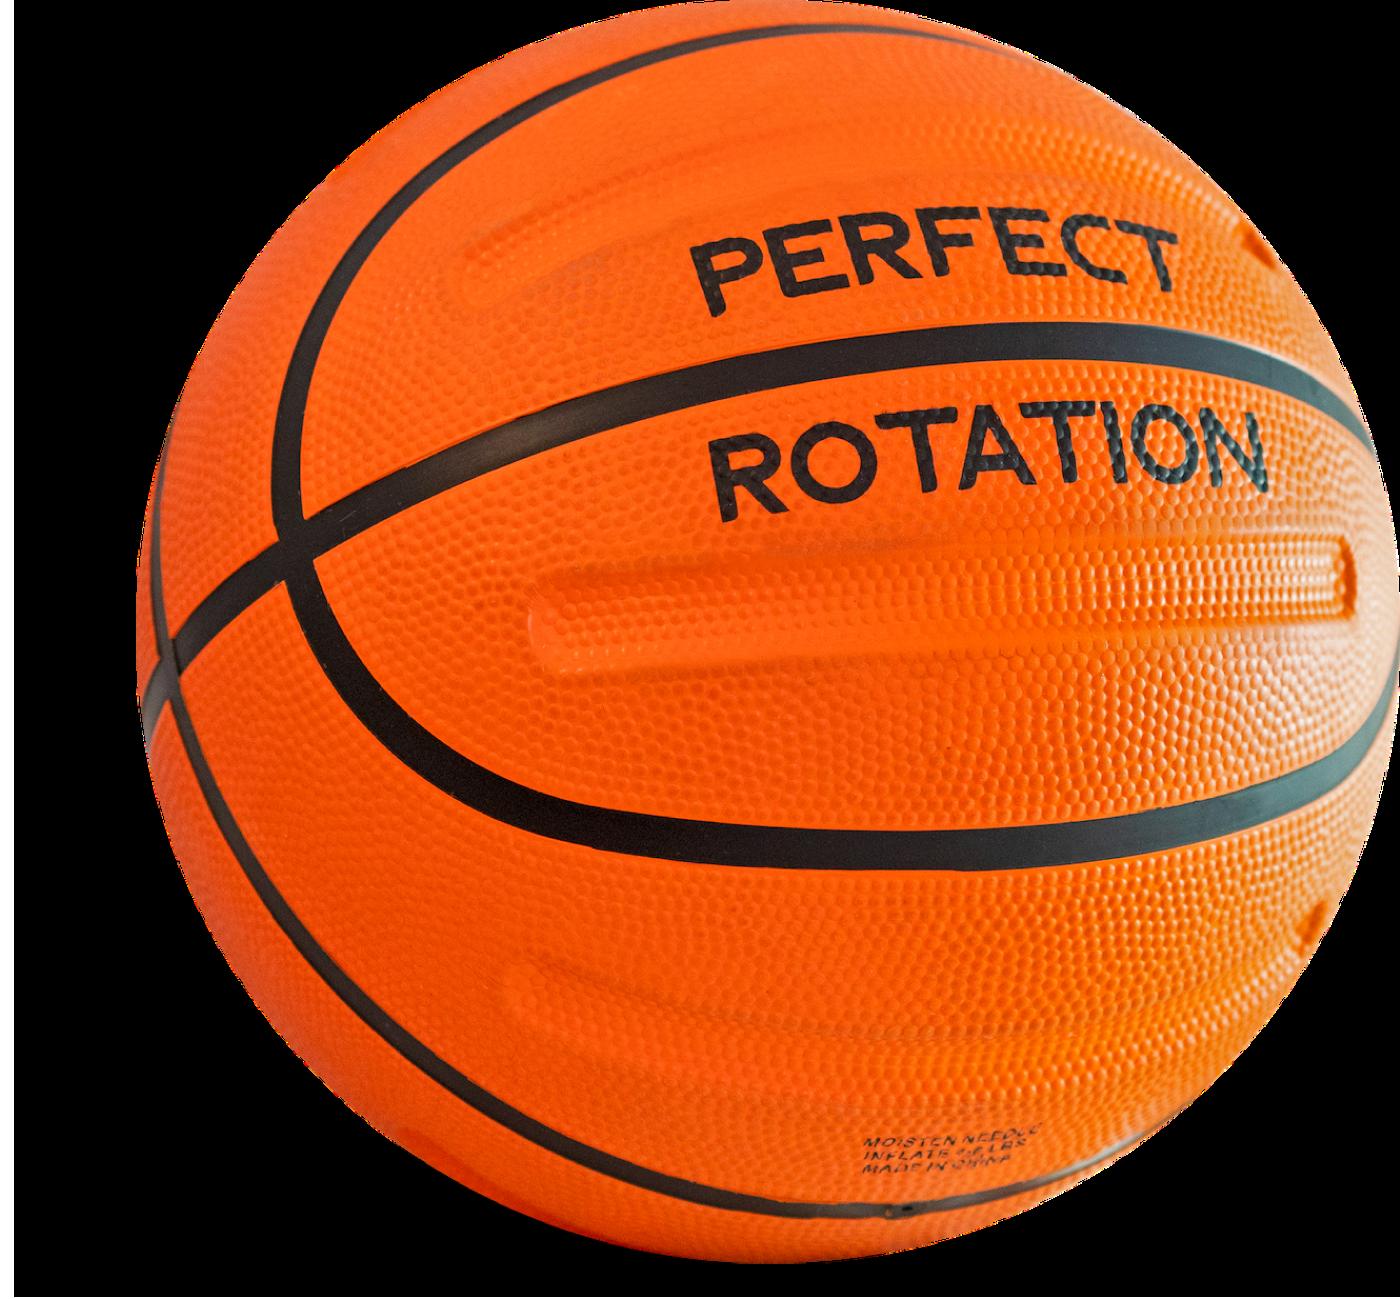 Perfect Rotation Basketball training ball